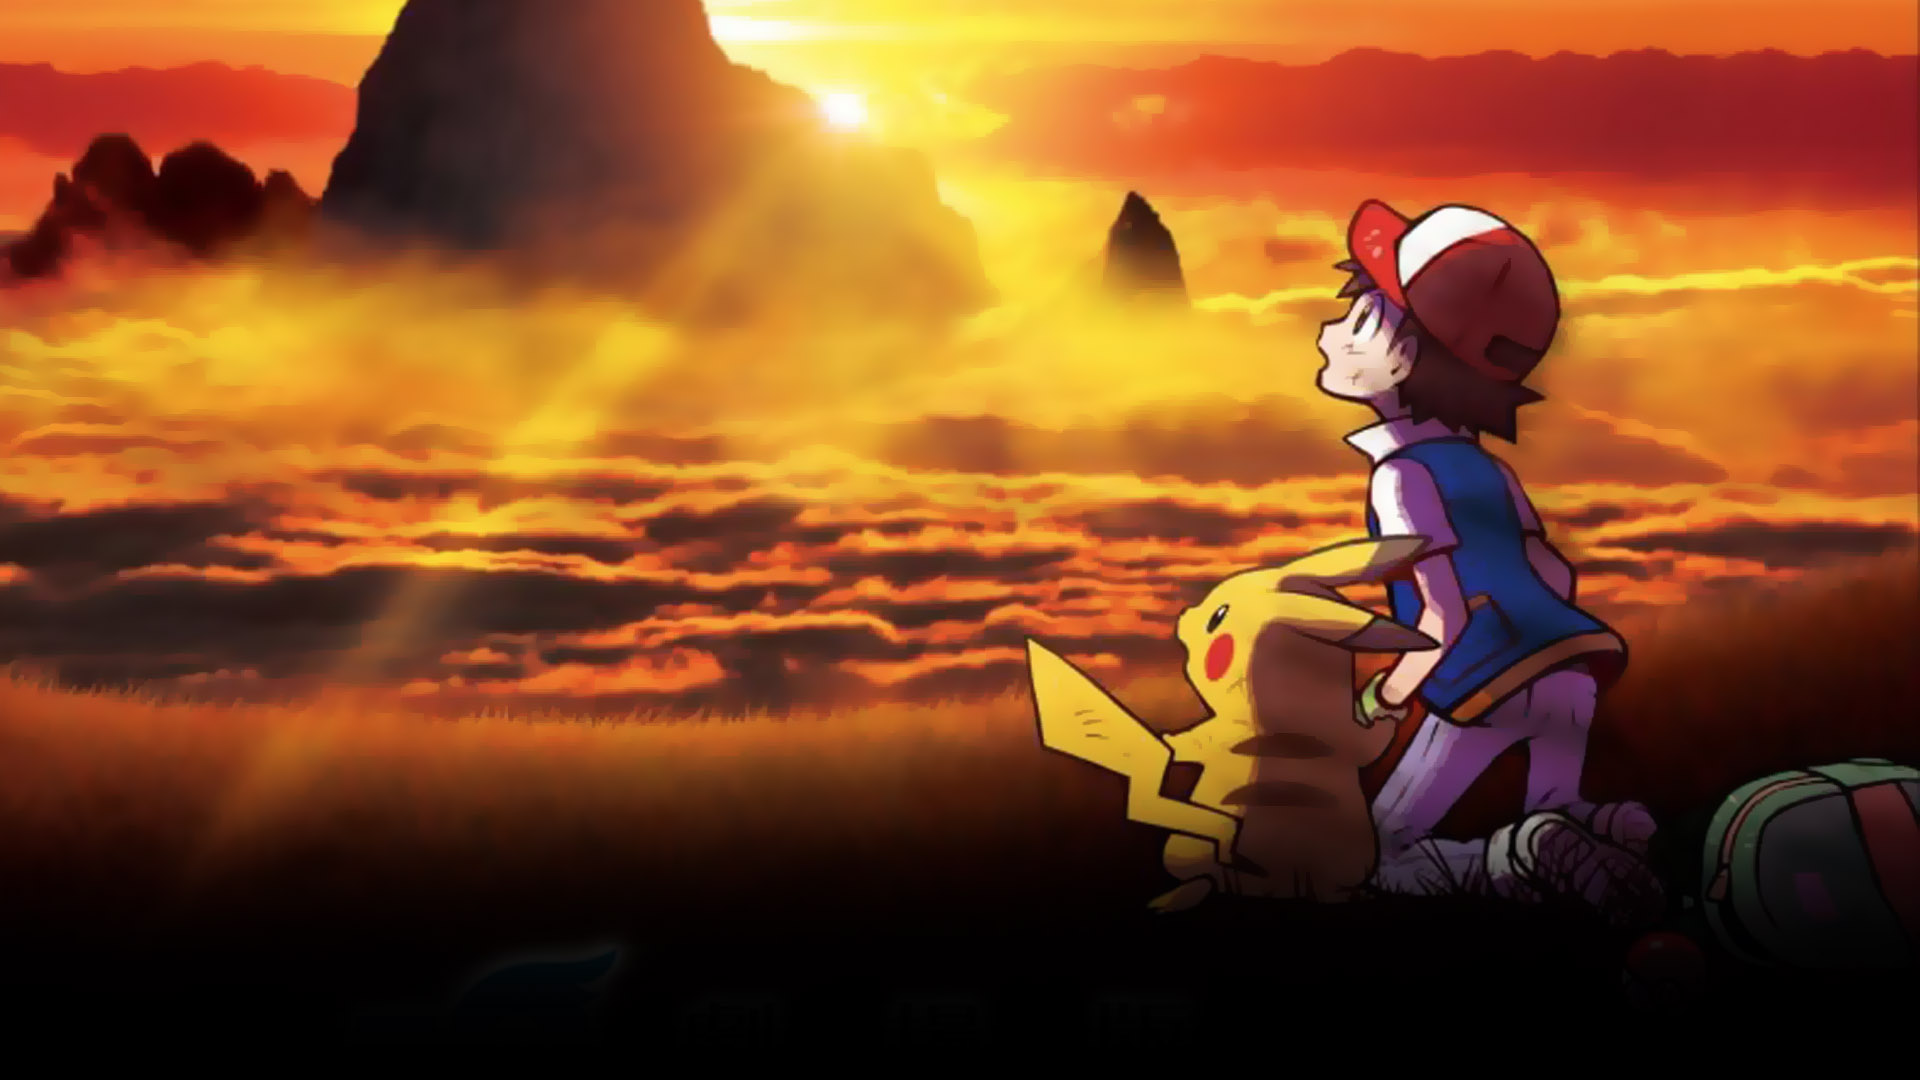 POkemon I choose you social cover image